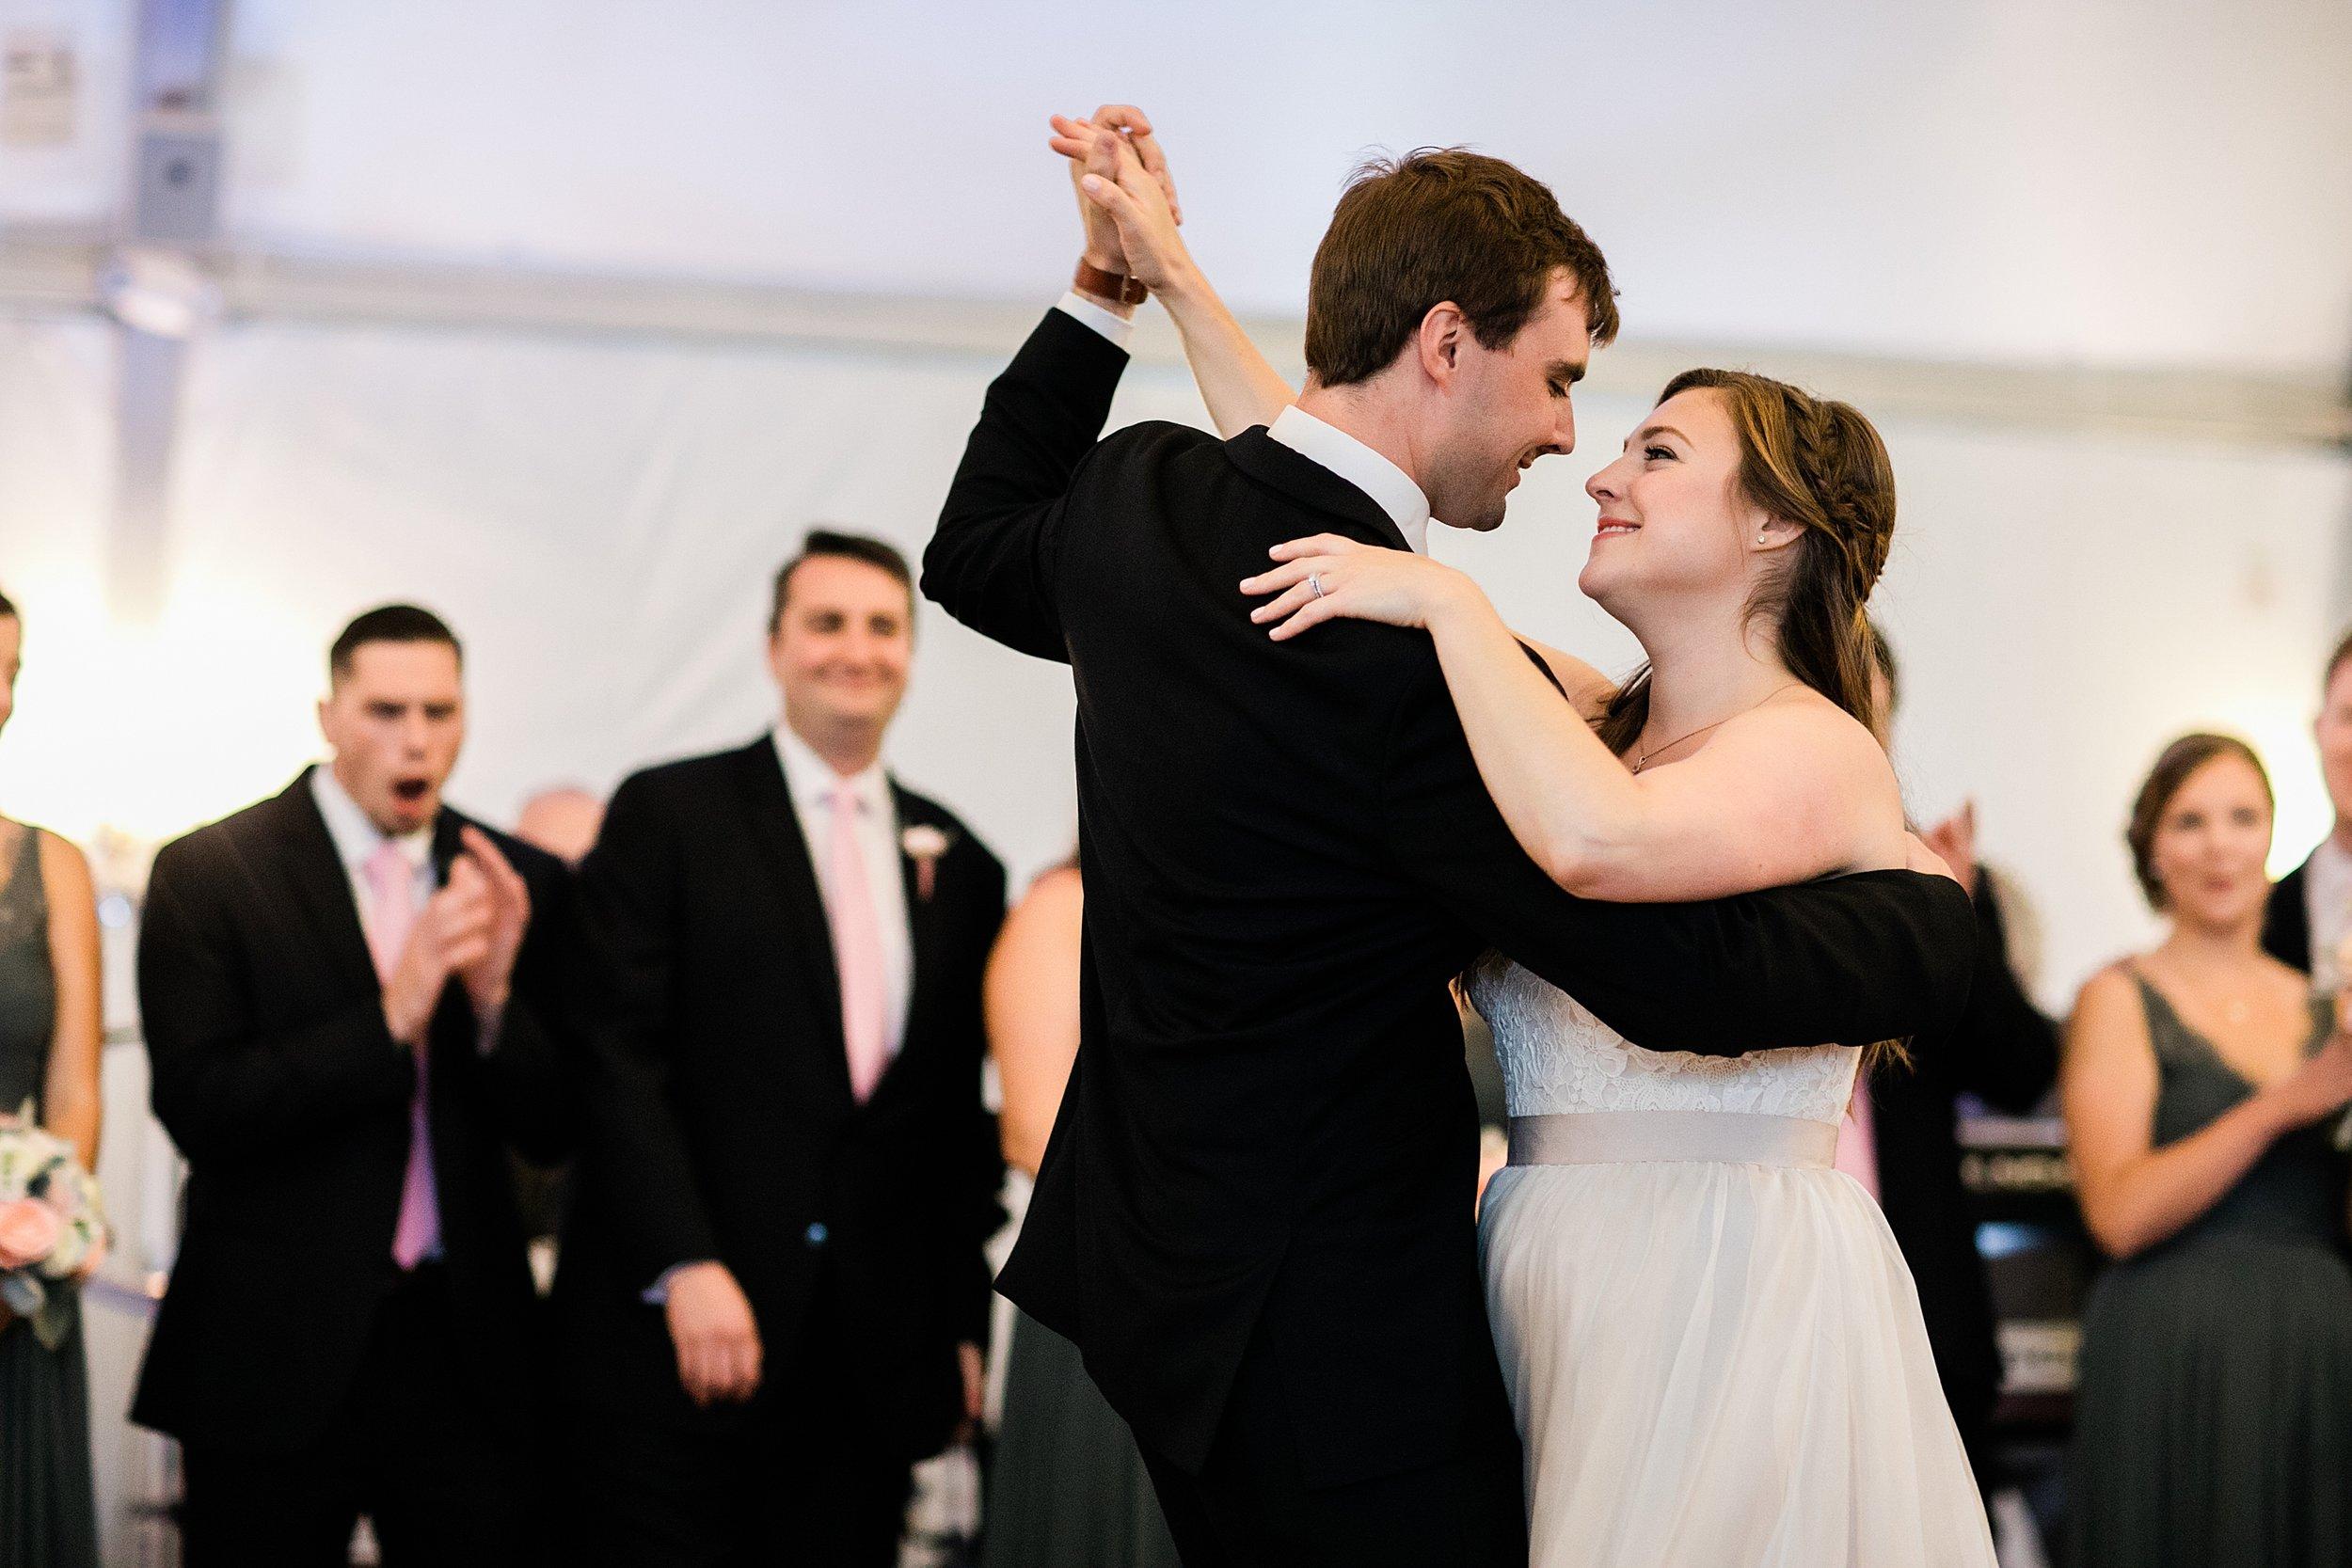 042 los angeles wedding photographer todd danforth photography boston.jpg